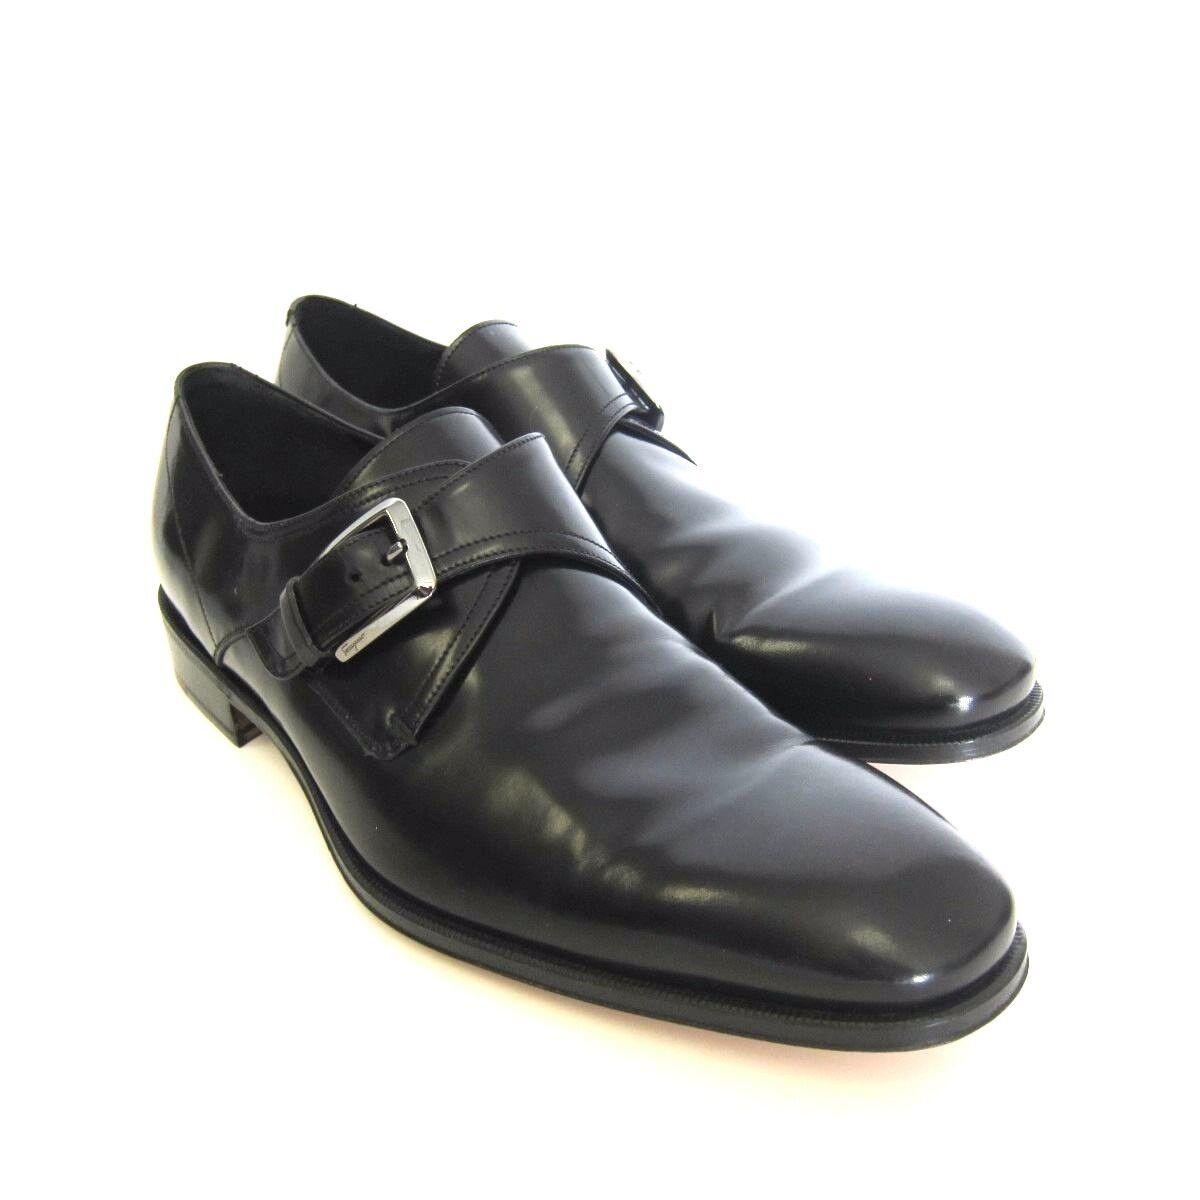 Y-1110252 Neuf Salvatore Ferragamo Cipro Chaussures Cuir Noir à Enfiler Taille